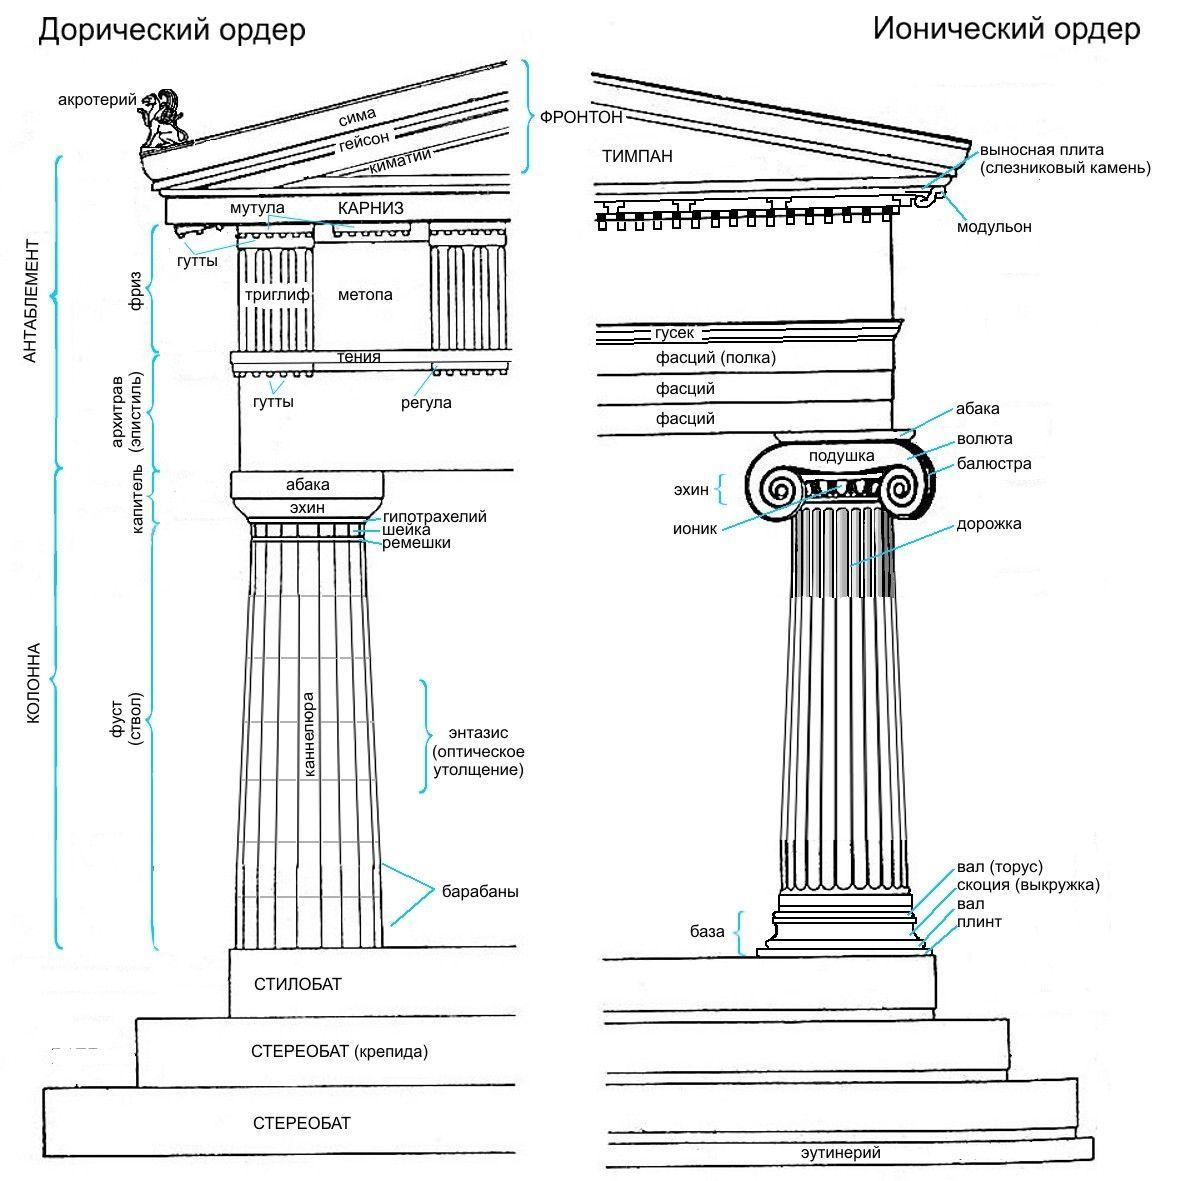 Architectureinterior